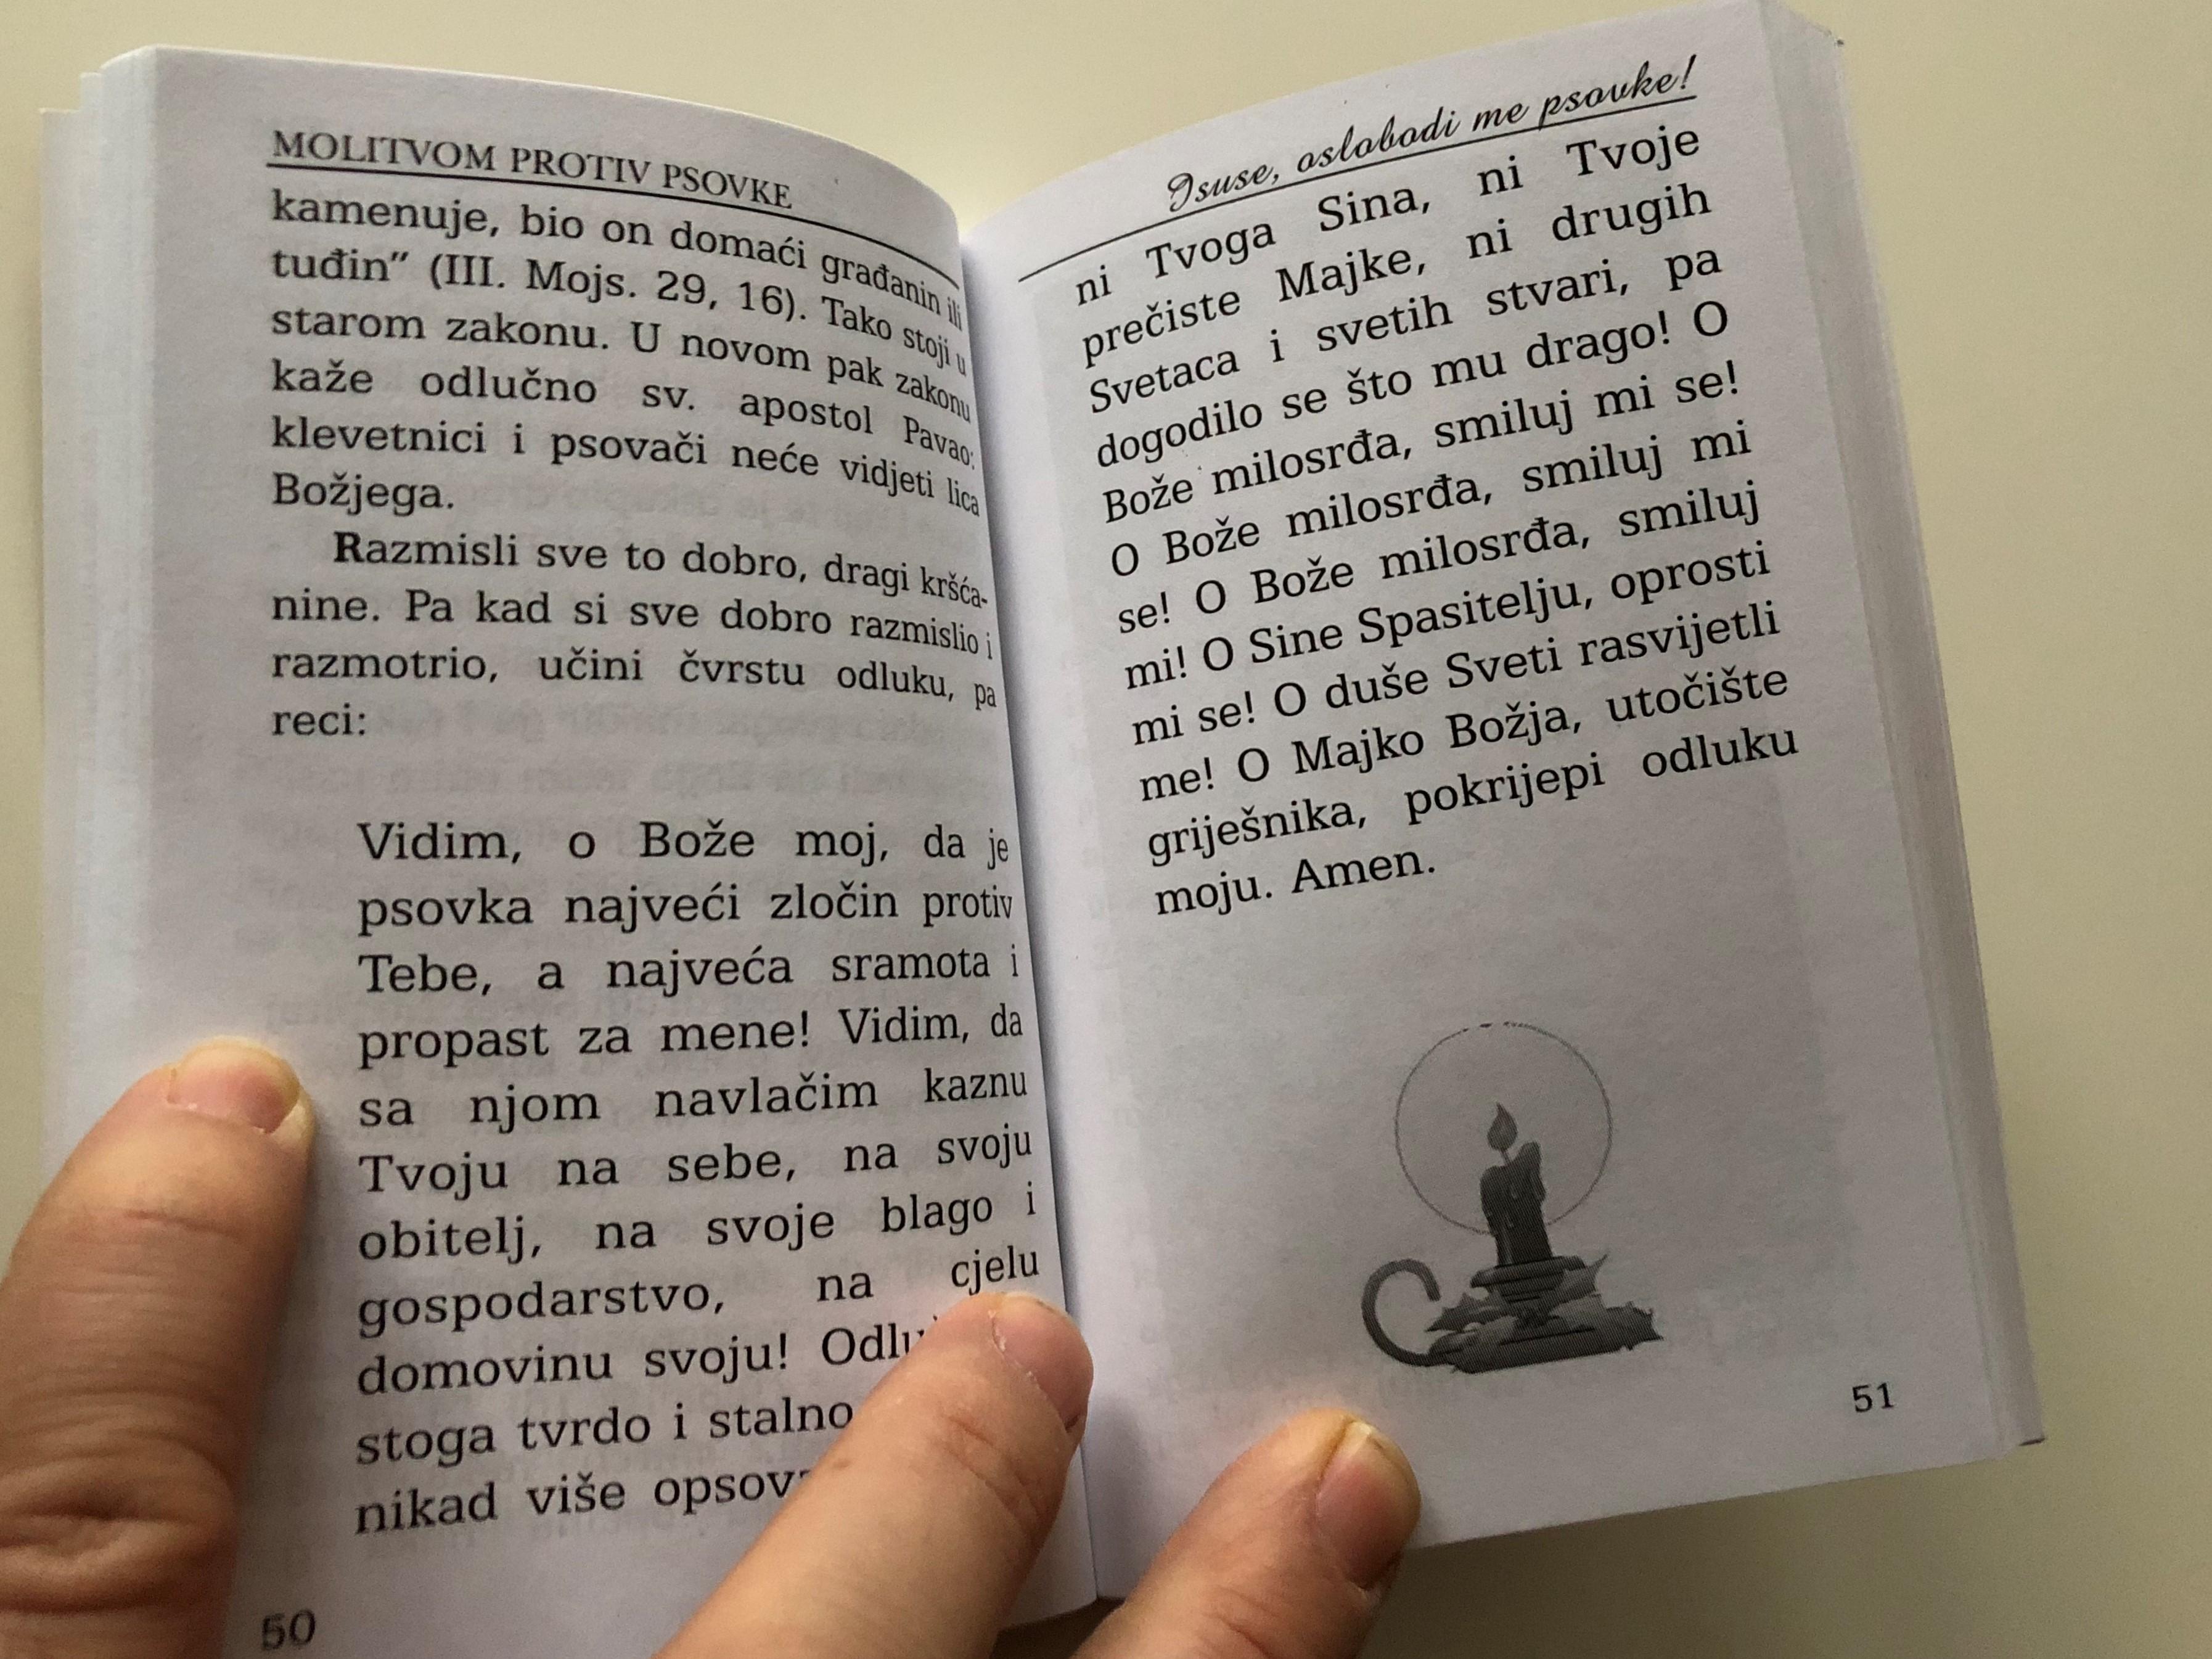 isuse-oslobodi-nas-psovke-jesus-set-us-free-from-cuss-words-croatian-language-prayerbook-help-to-those-struggling-with-swearing-6-.jpg